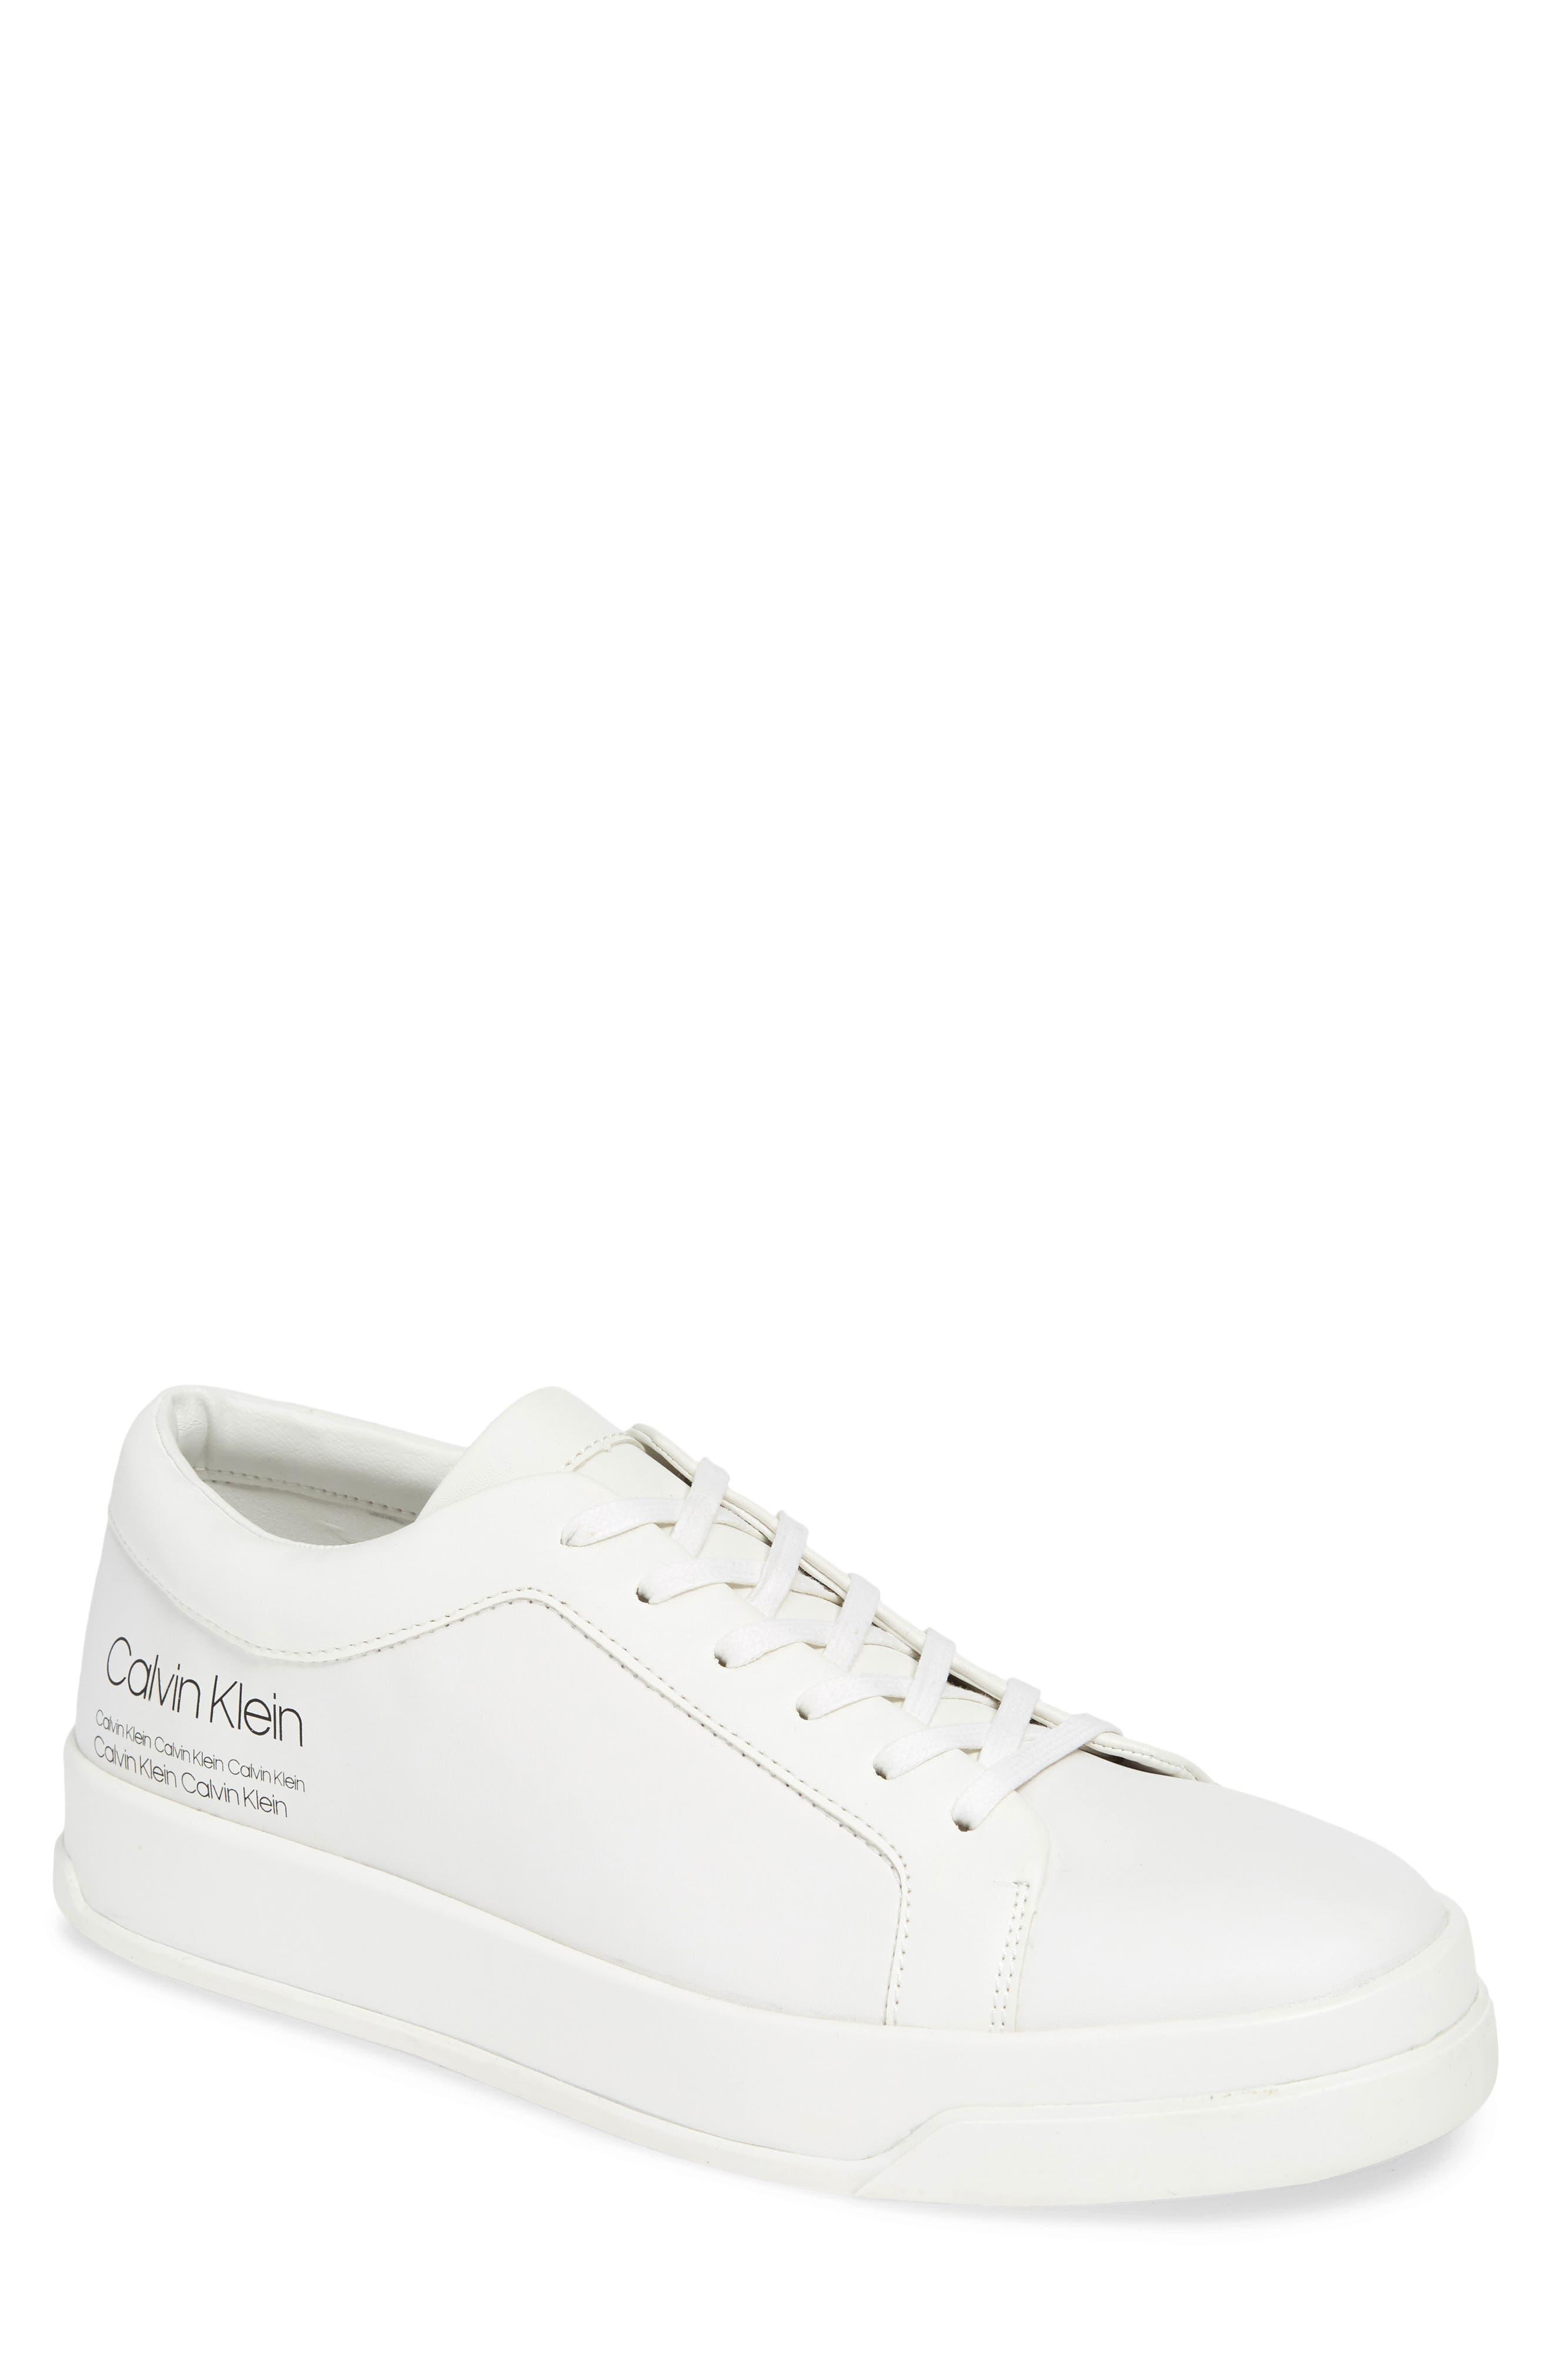 Nike Men's Air Max 97 Shoes WhiteSilverWolf Grey | Sport